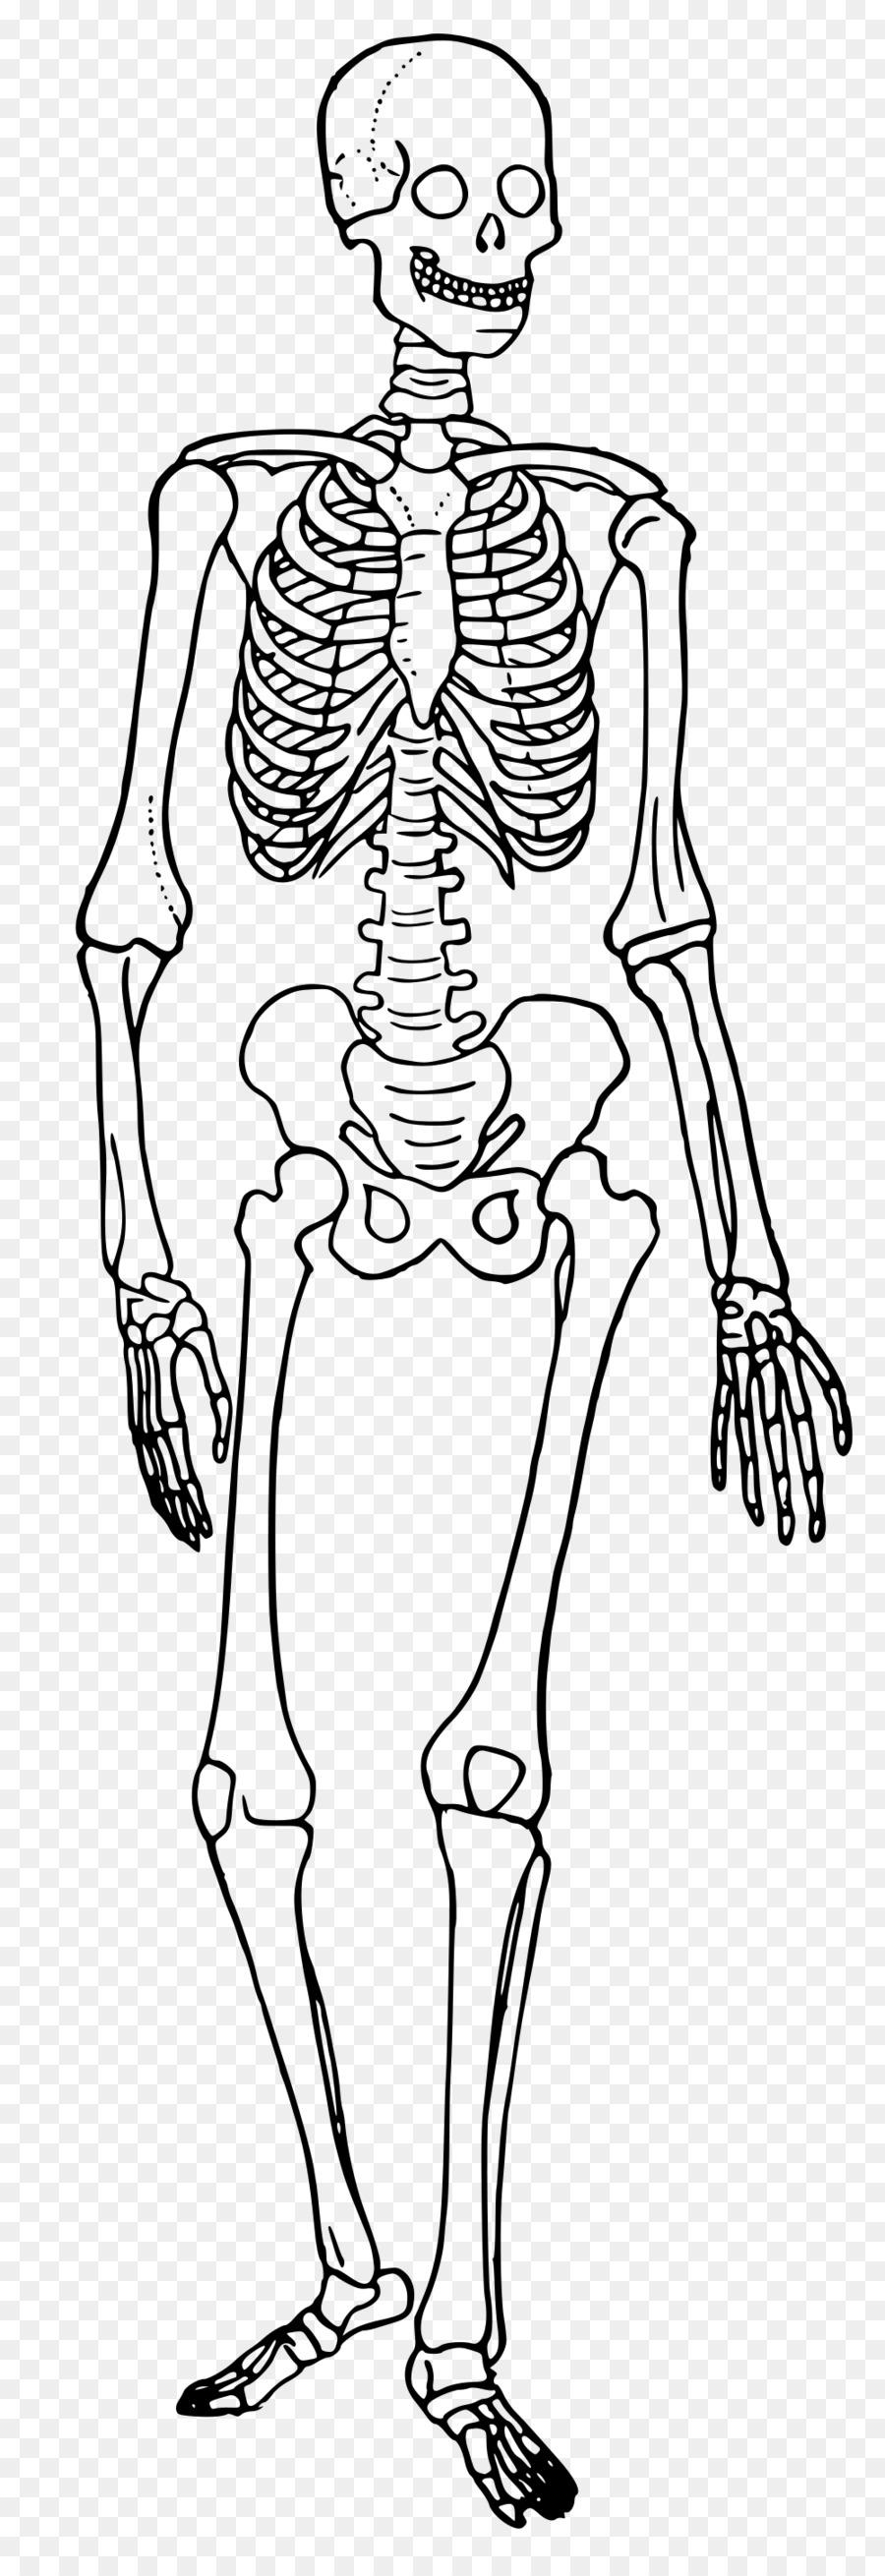 The Skeletal System Human skeleton Human body Diagram Bone ...